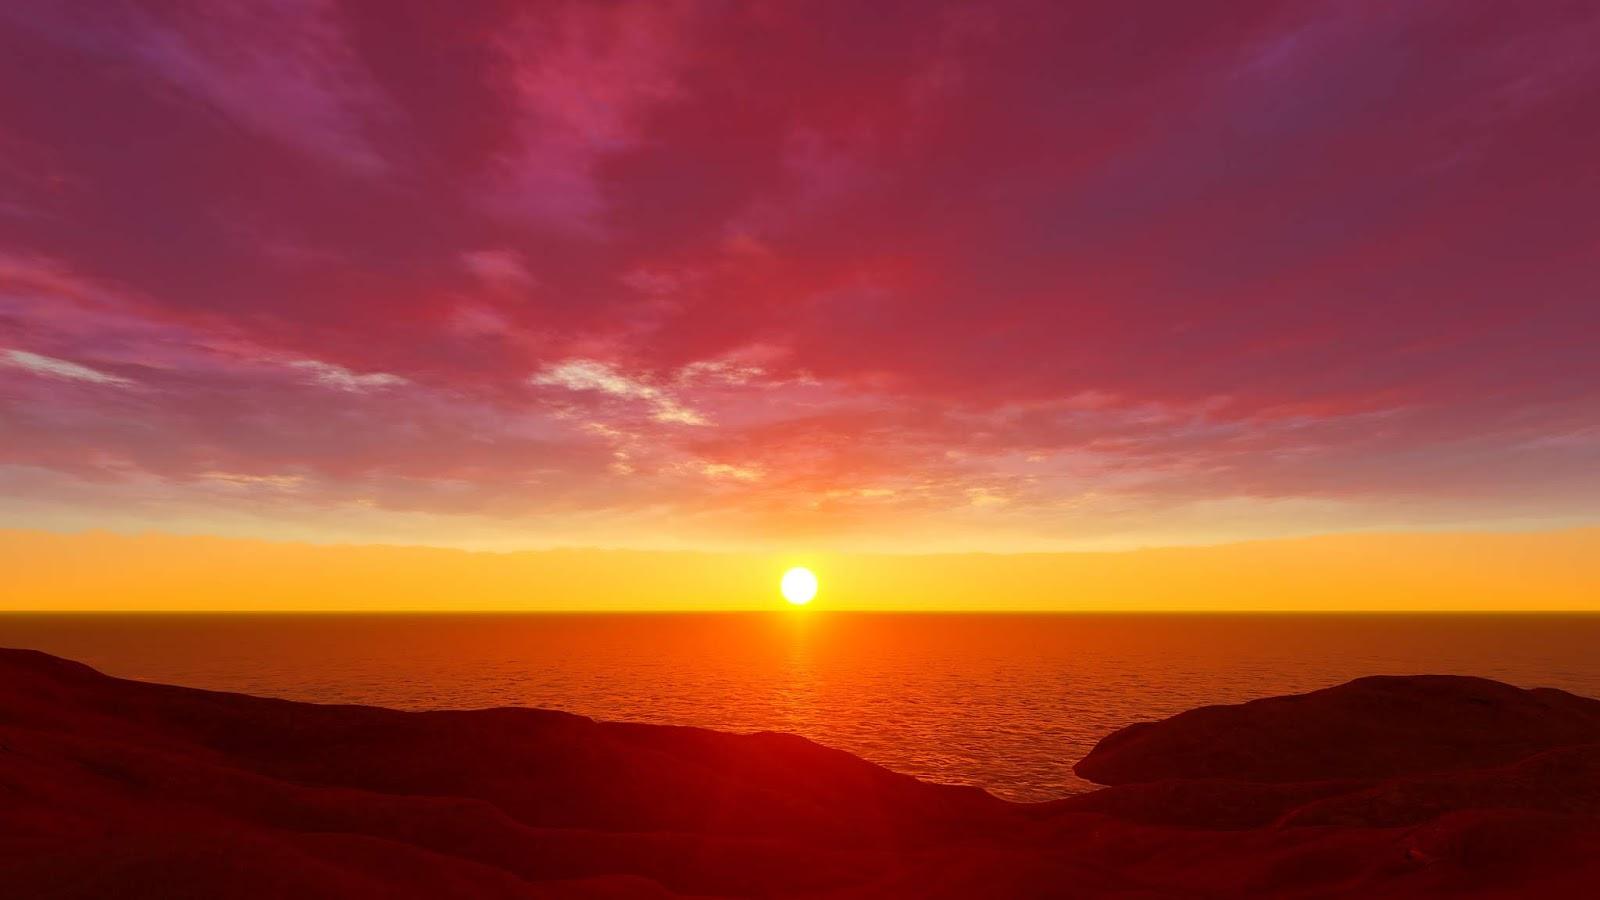 Ảnh backgroud mặt trời lặn trên biển